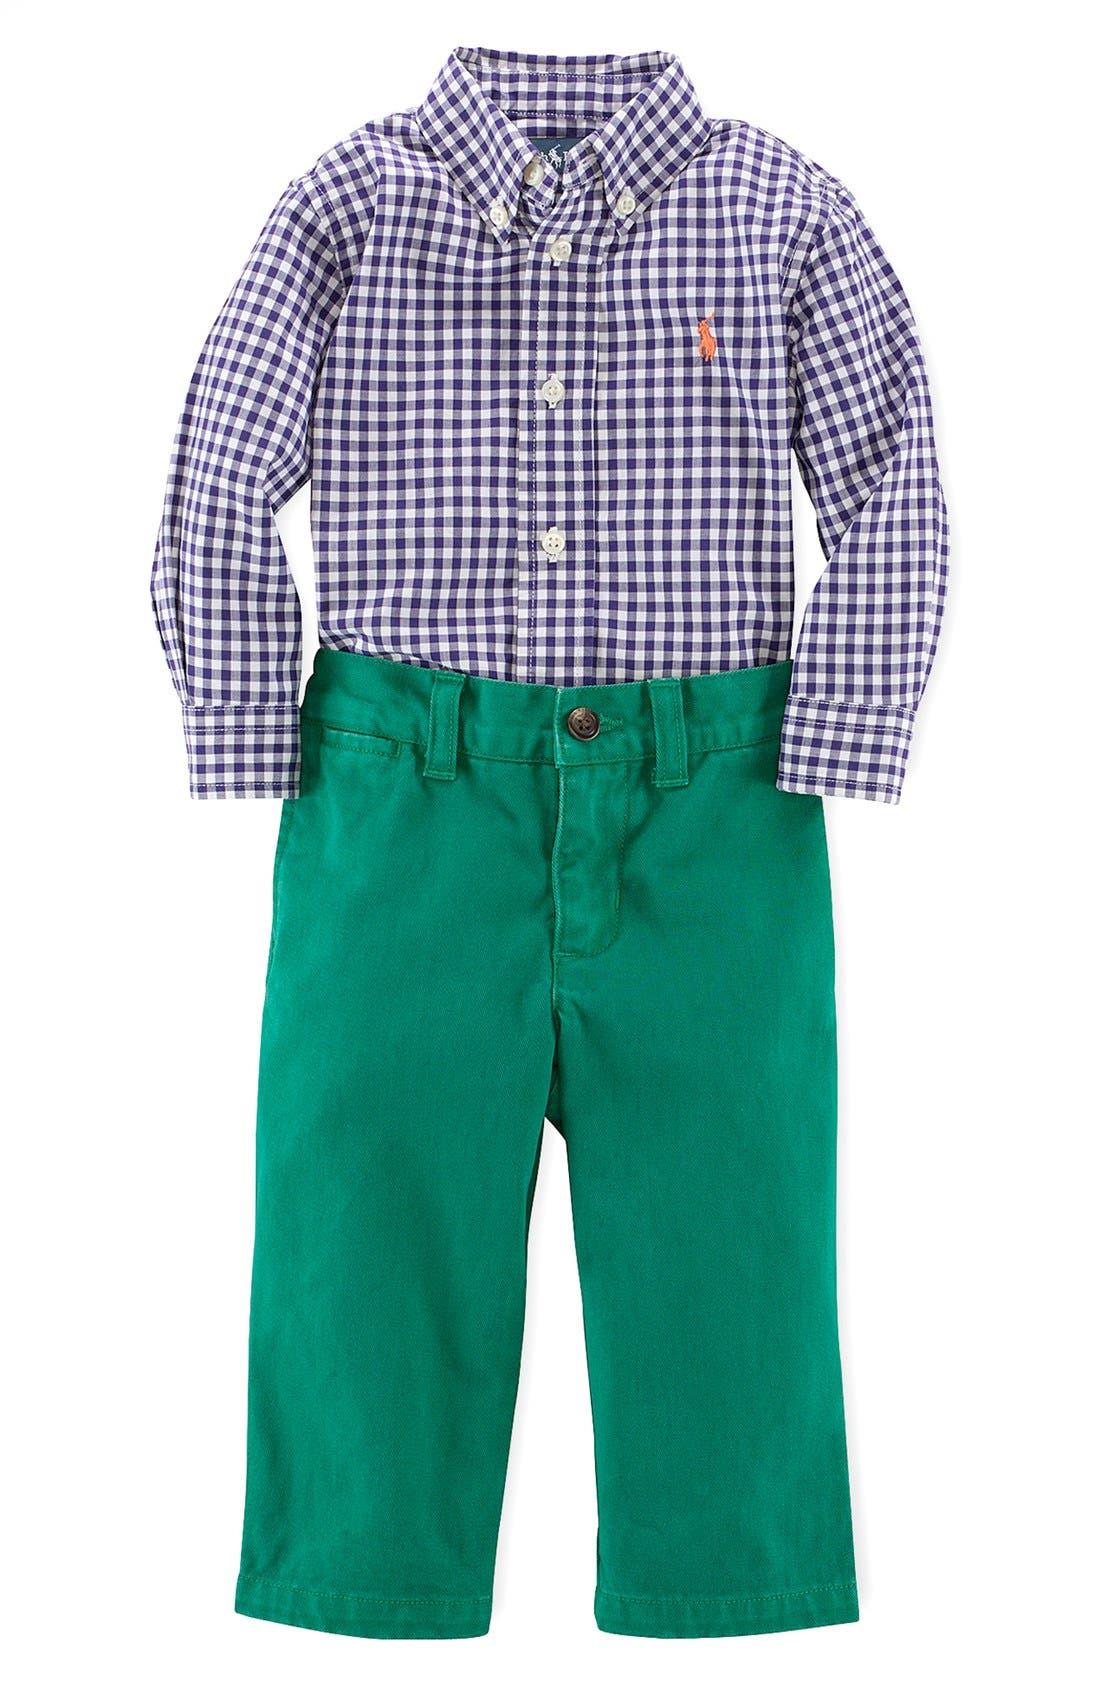 Alternate Image 1 Selected - Ralph Lauren Shirt & Chinos (Baby Boys)